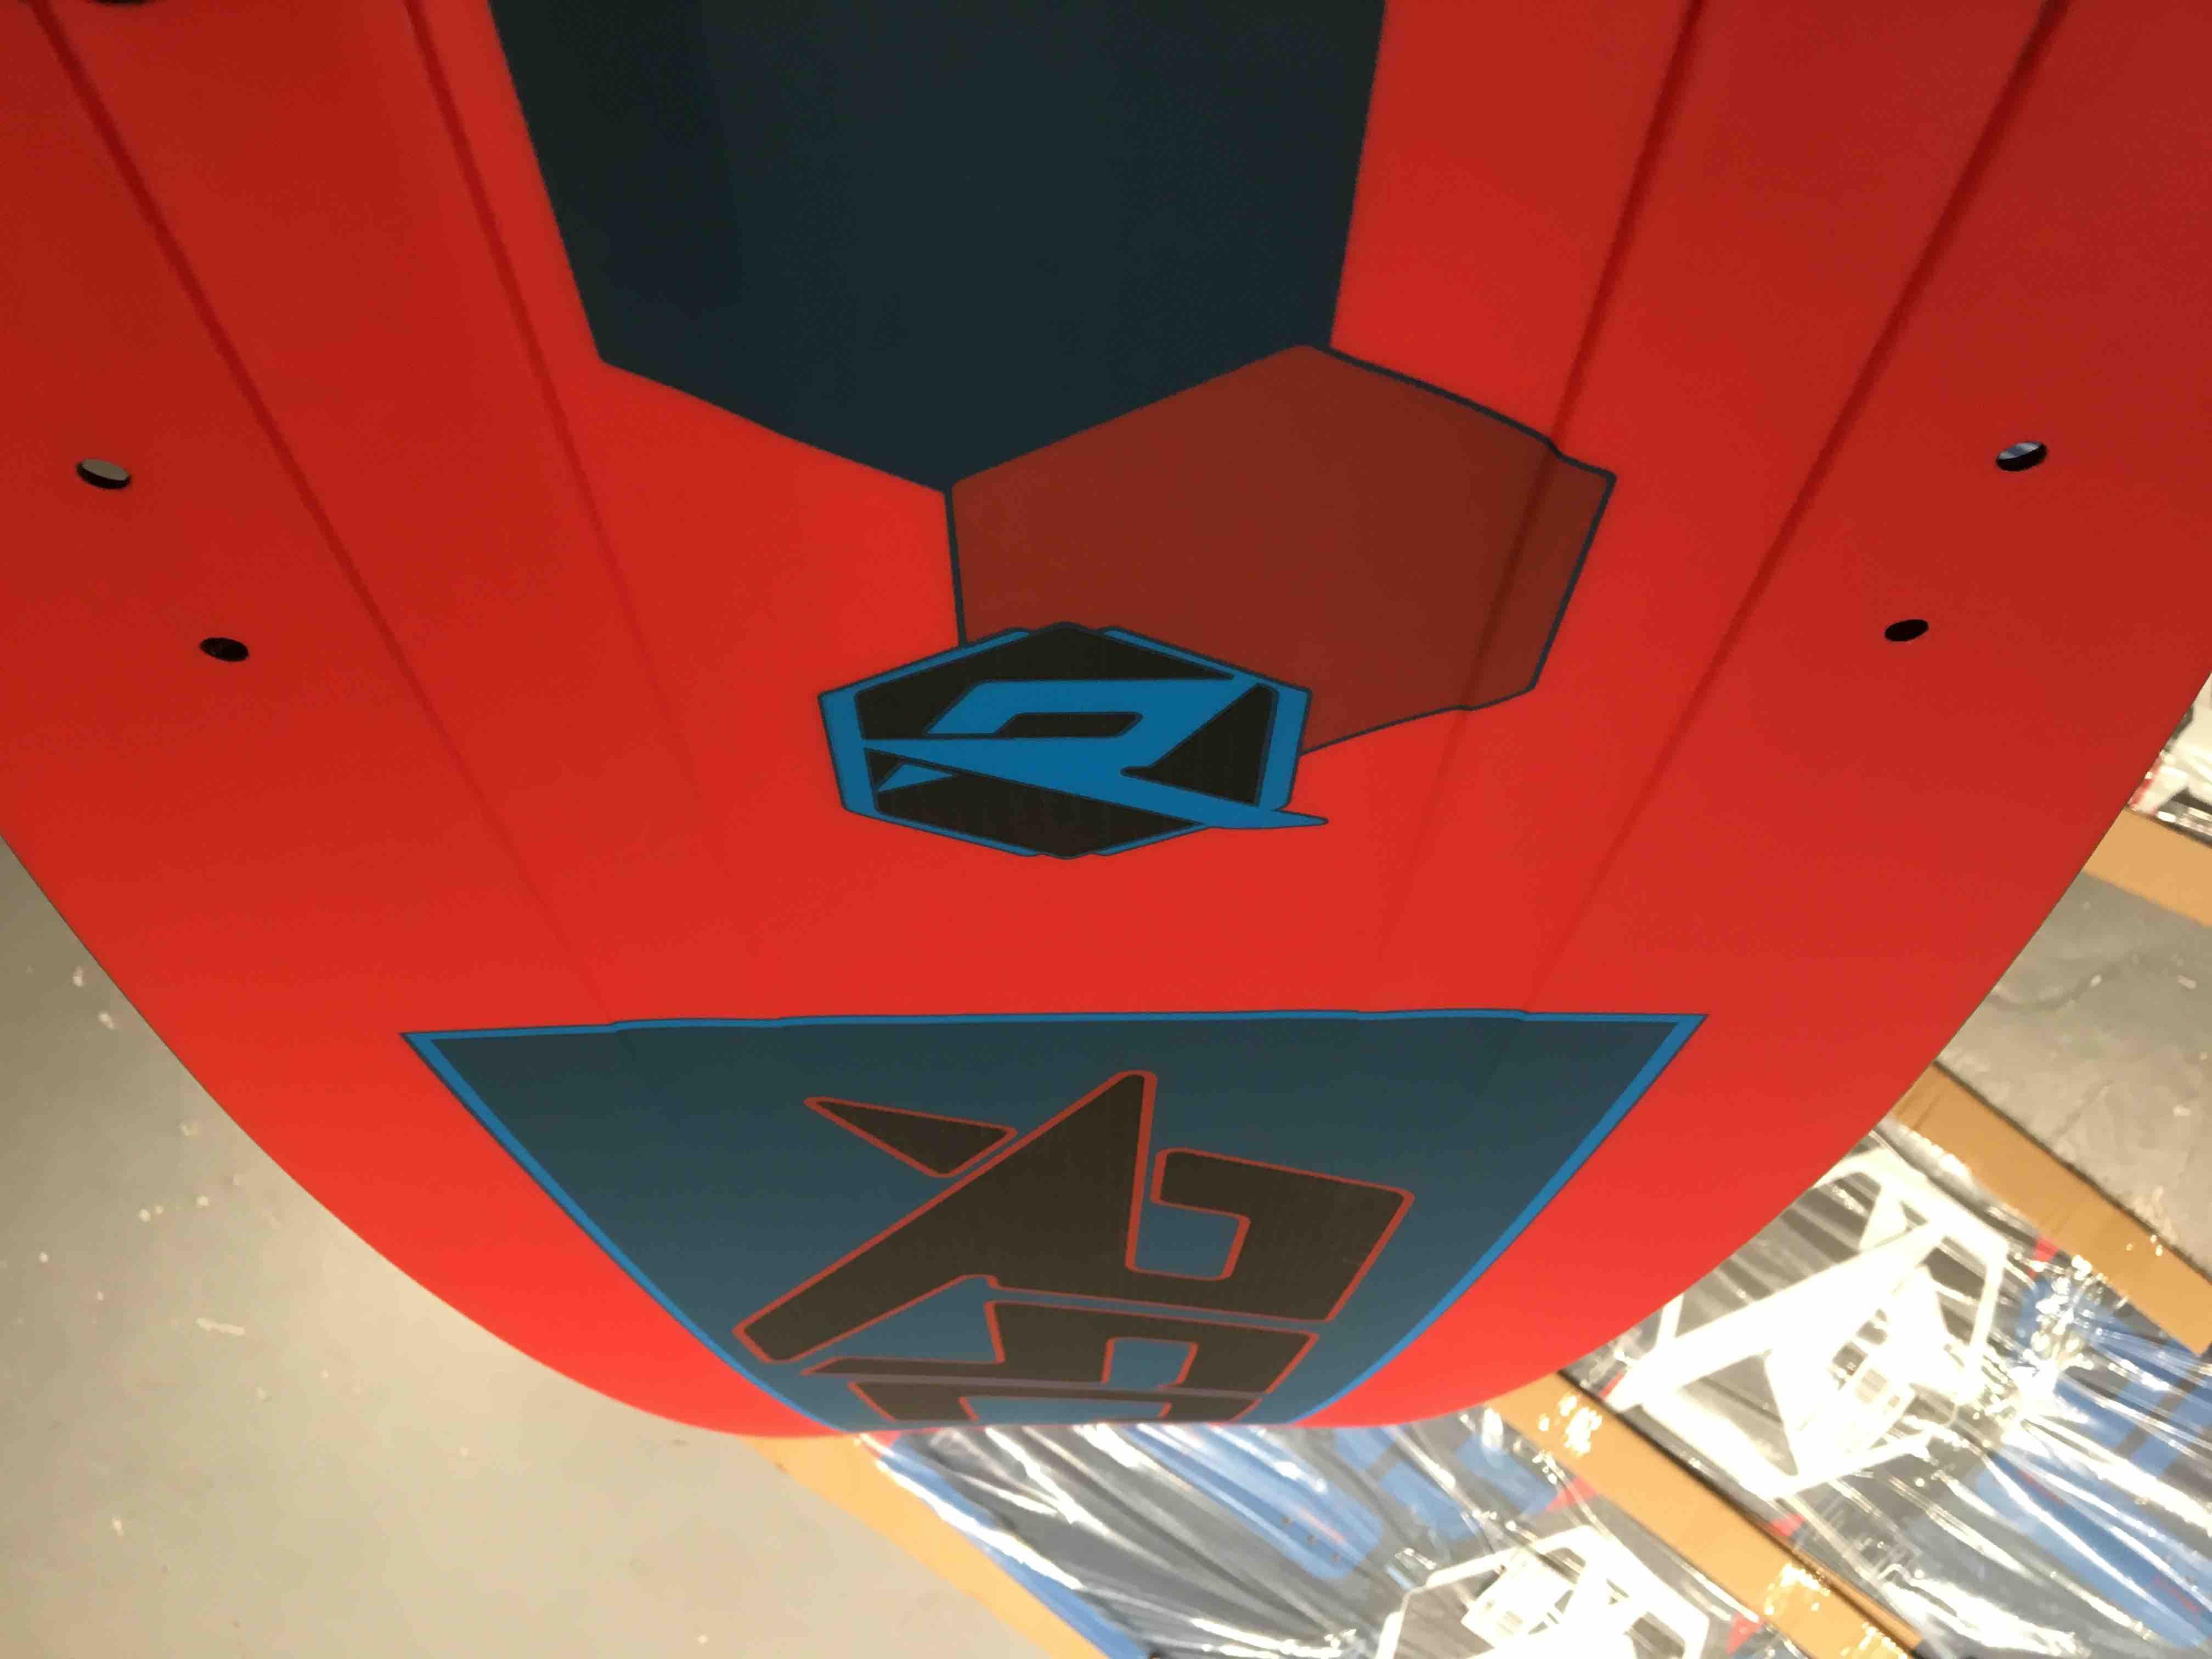 Planche Twin-Tip Kitesurf RSC Supreme Pro 2018 The Corner Shop_4